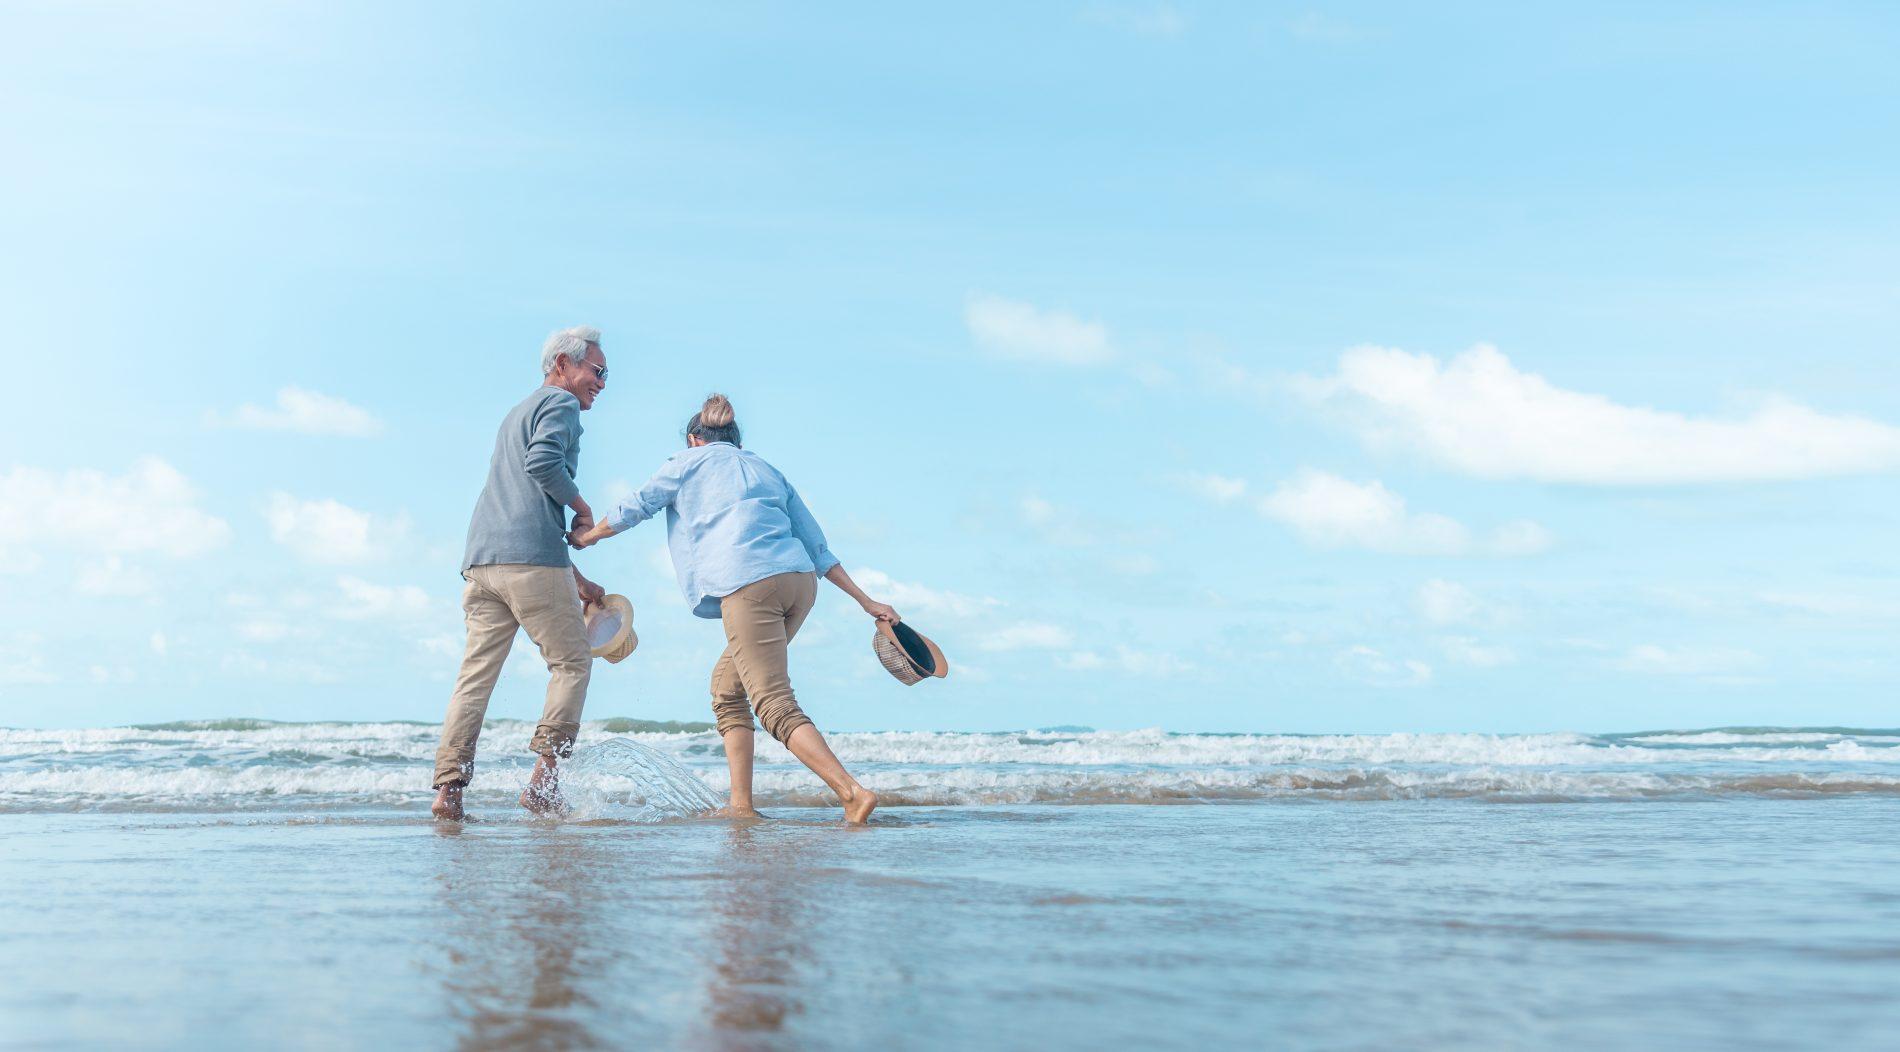 High-End Senior Living has Come to Kiawah Island